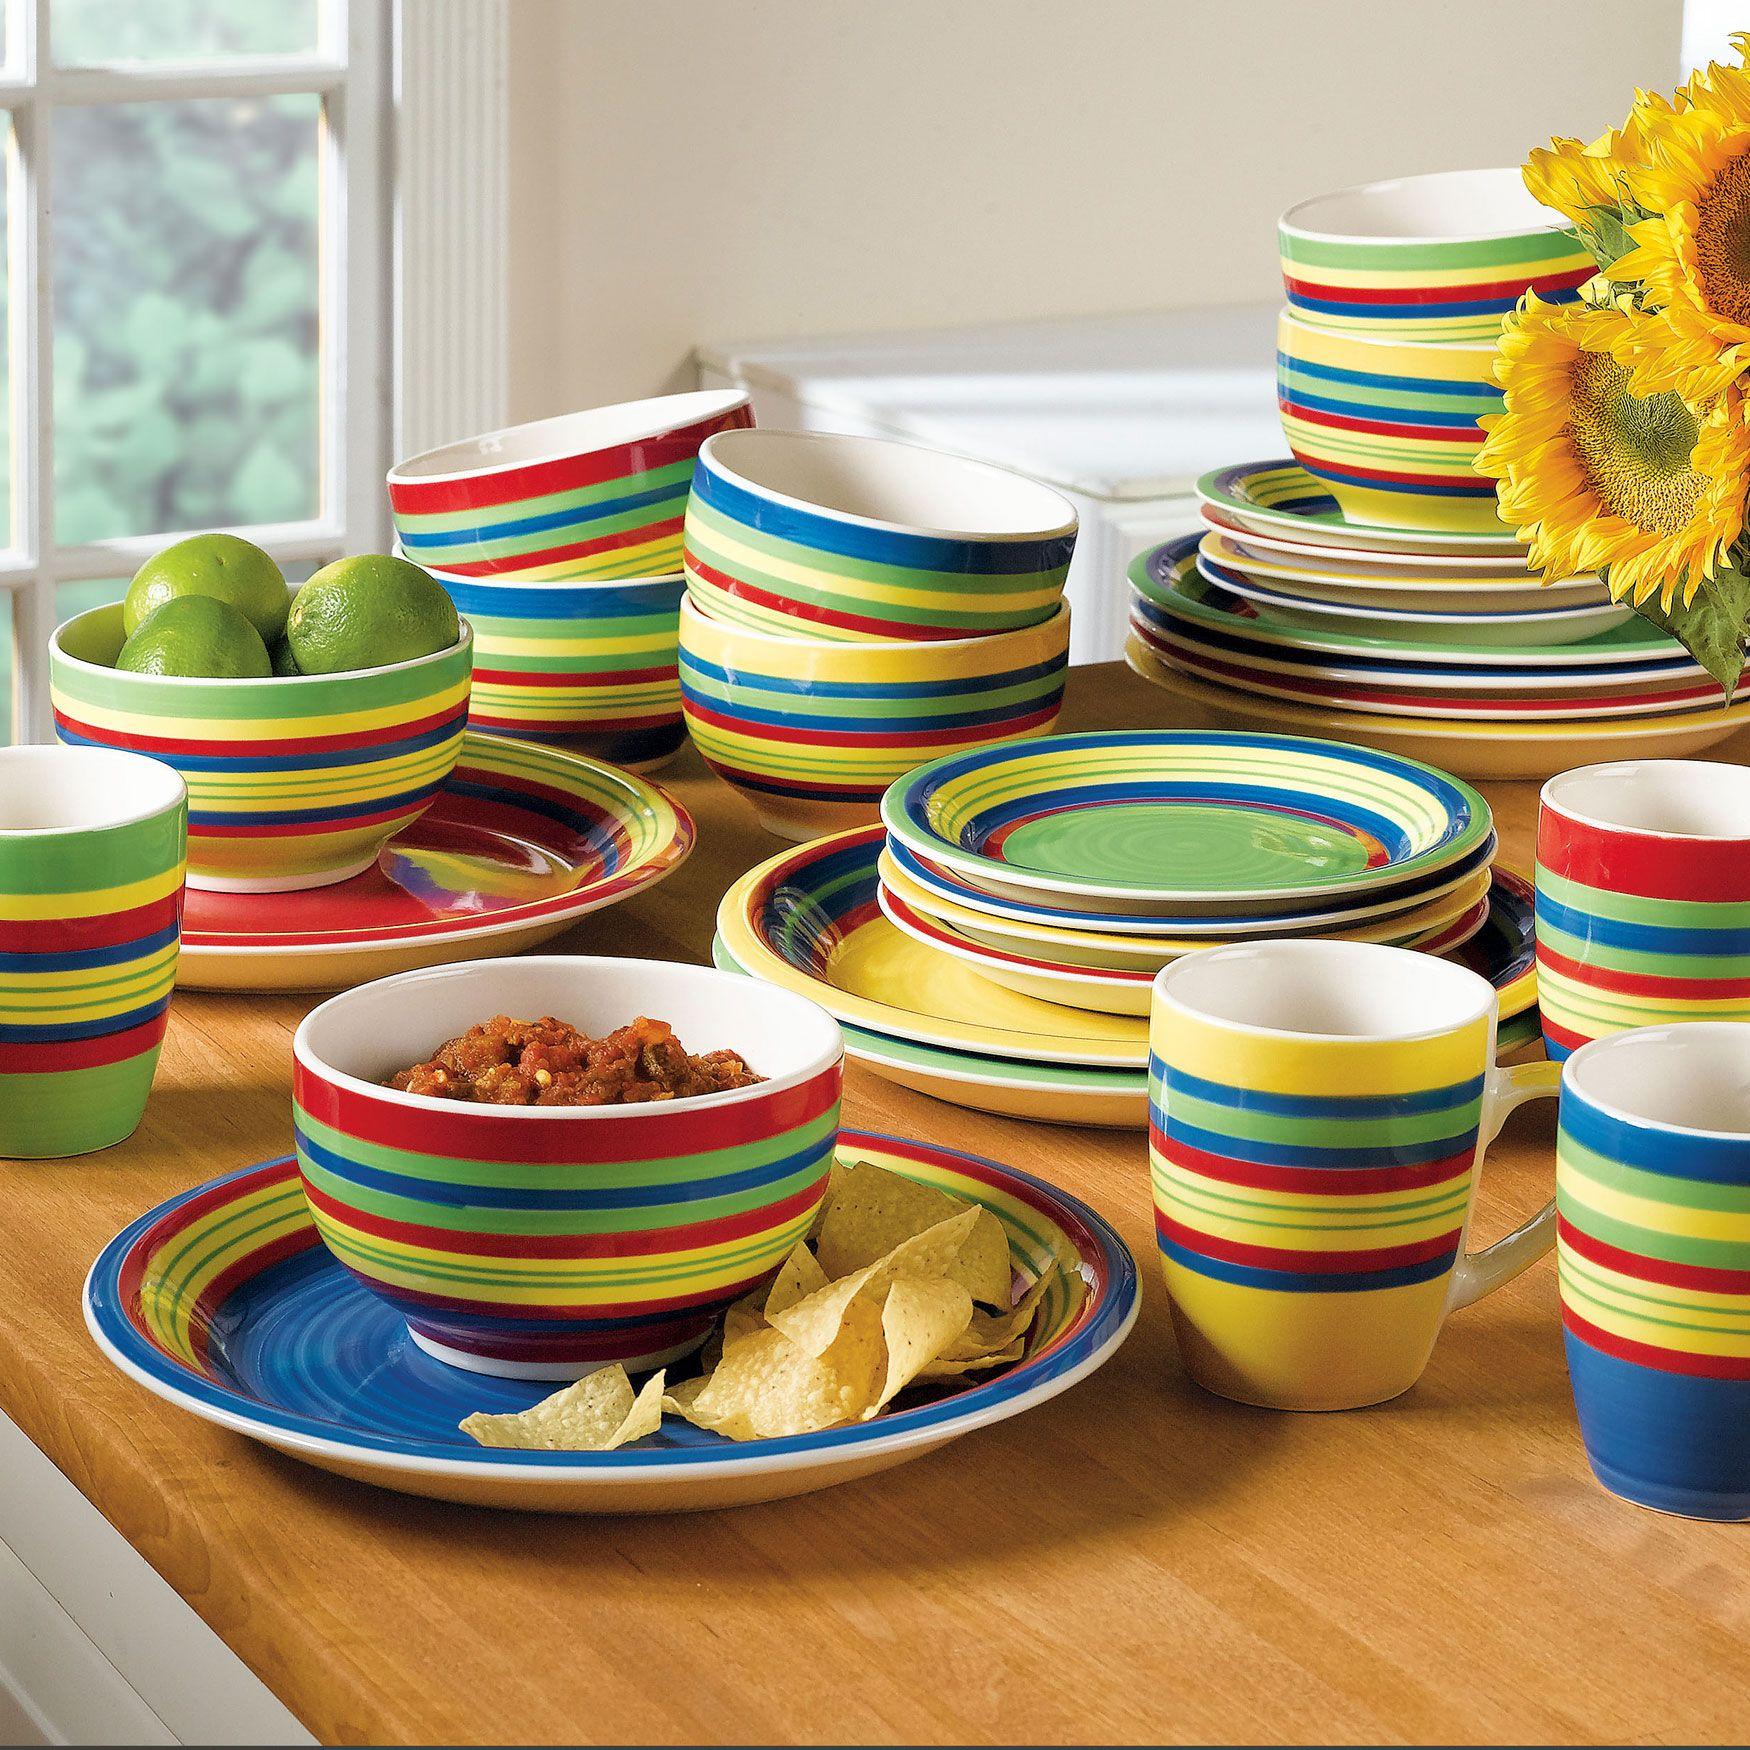 Santa Fe Collection Dinnerware Flatware Brylanehome Stoneware Dinnerware Dinnerware Dish Sets